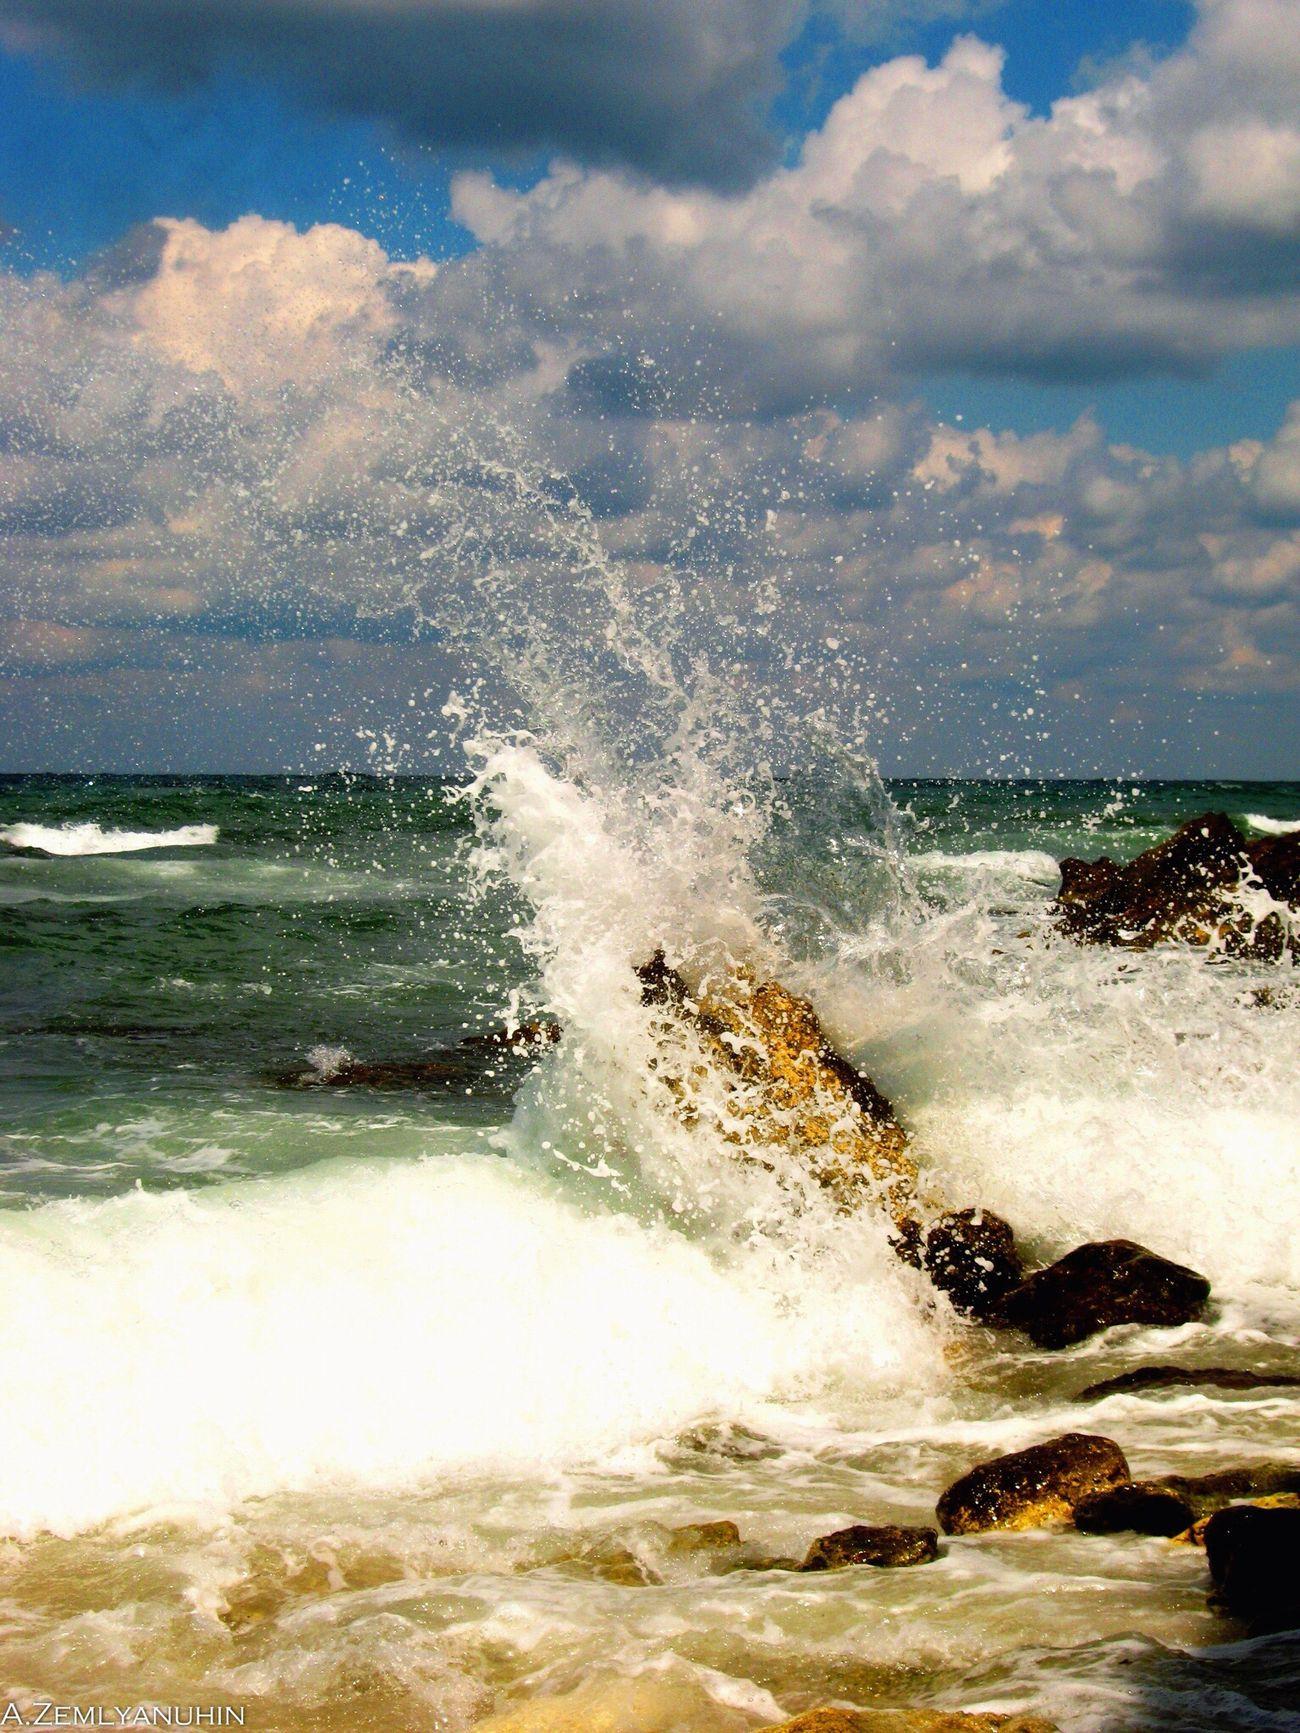 Seastorm Sea Stone Water Sevastopol  Summer Cloud - Sky EyeEmNewHere EyeEmNewHere EyeEmNewHere Blacksea